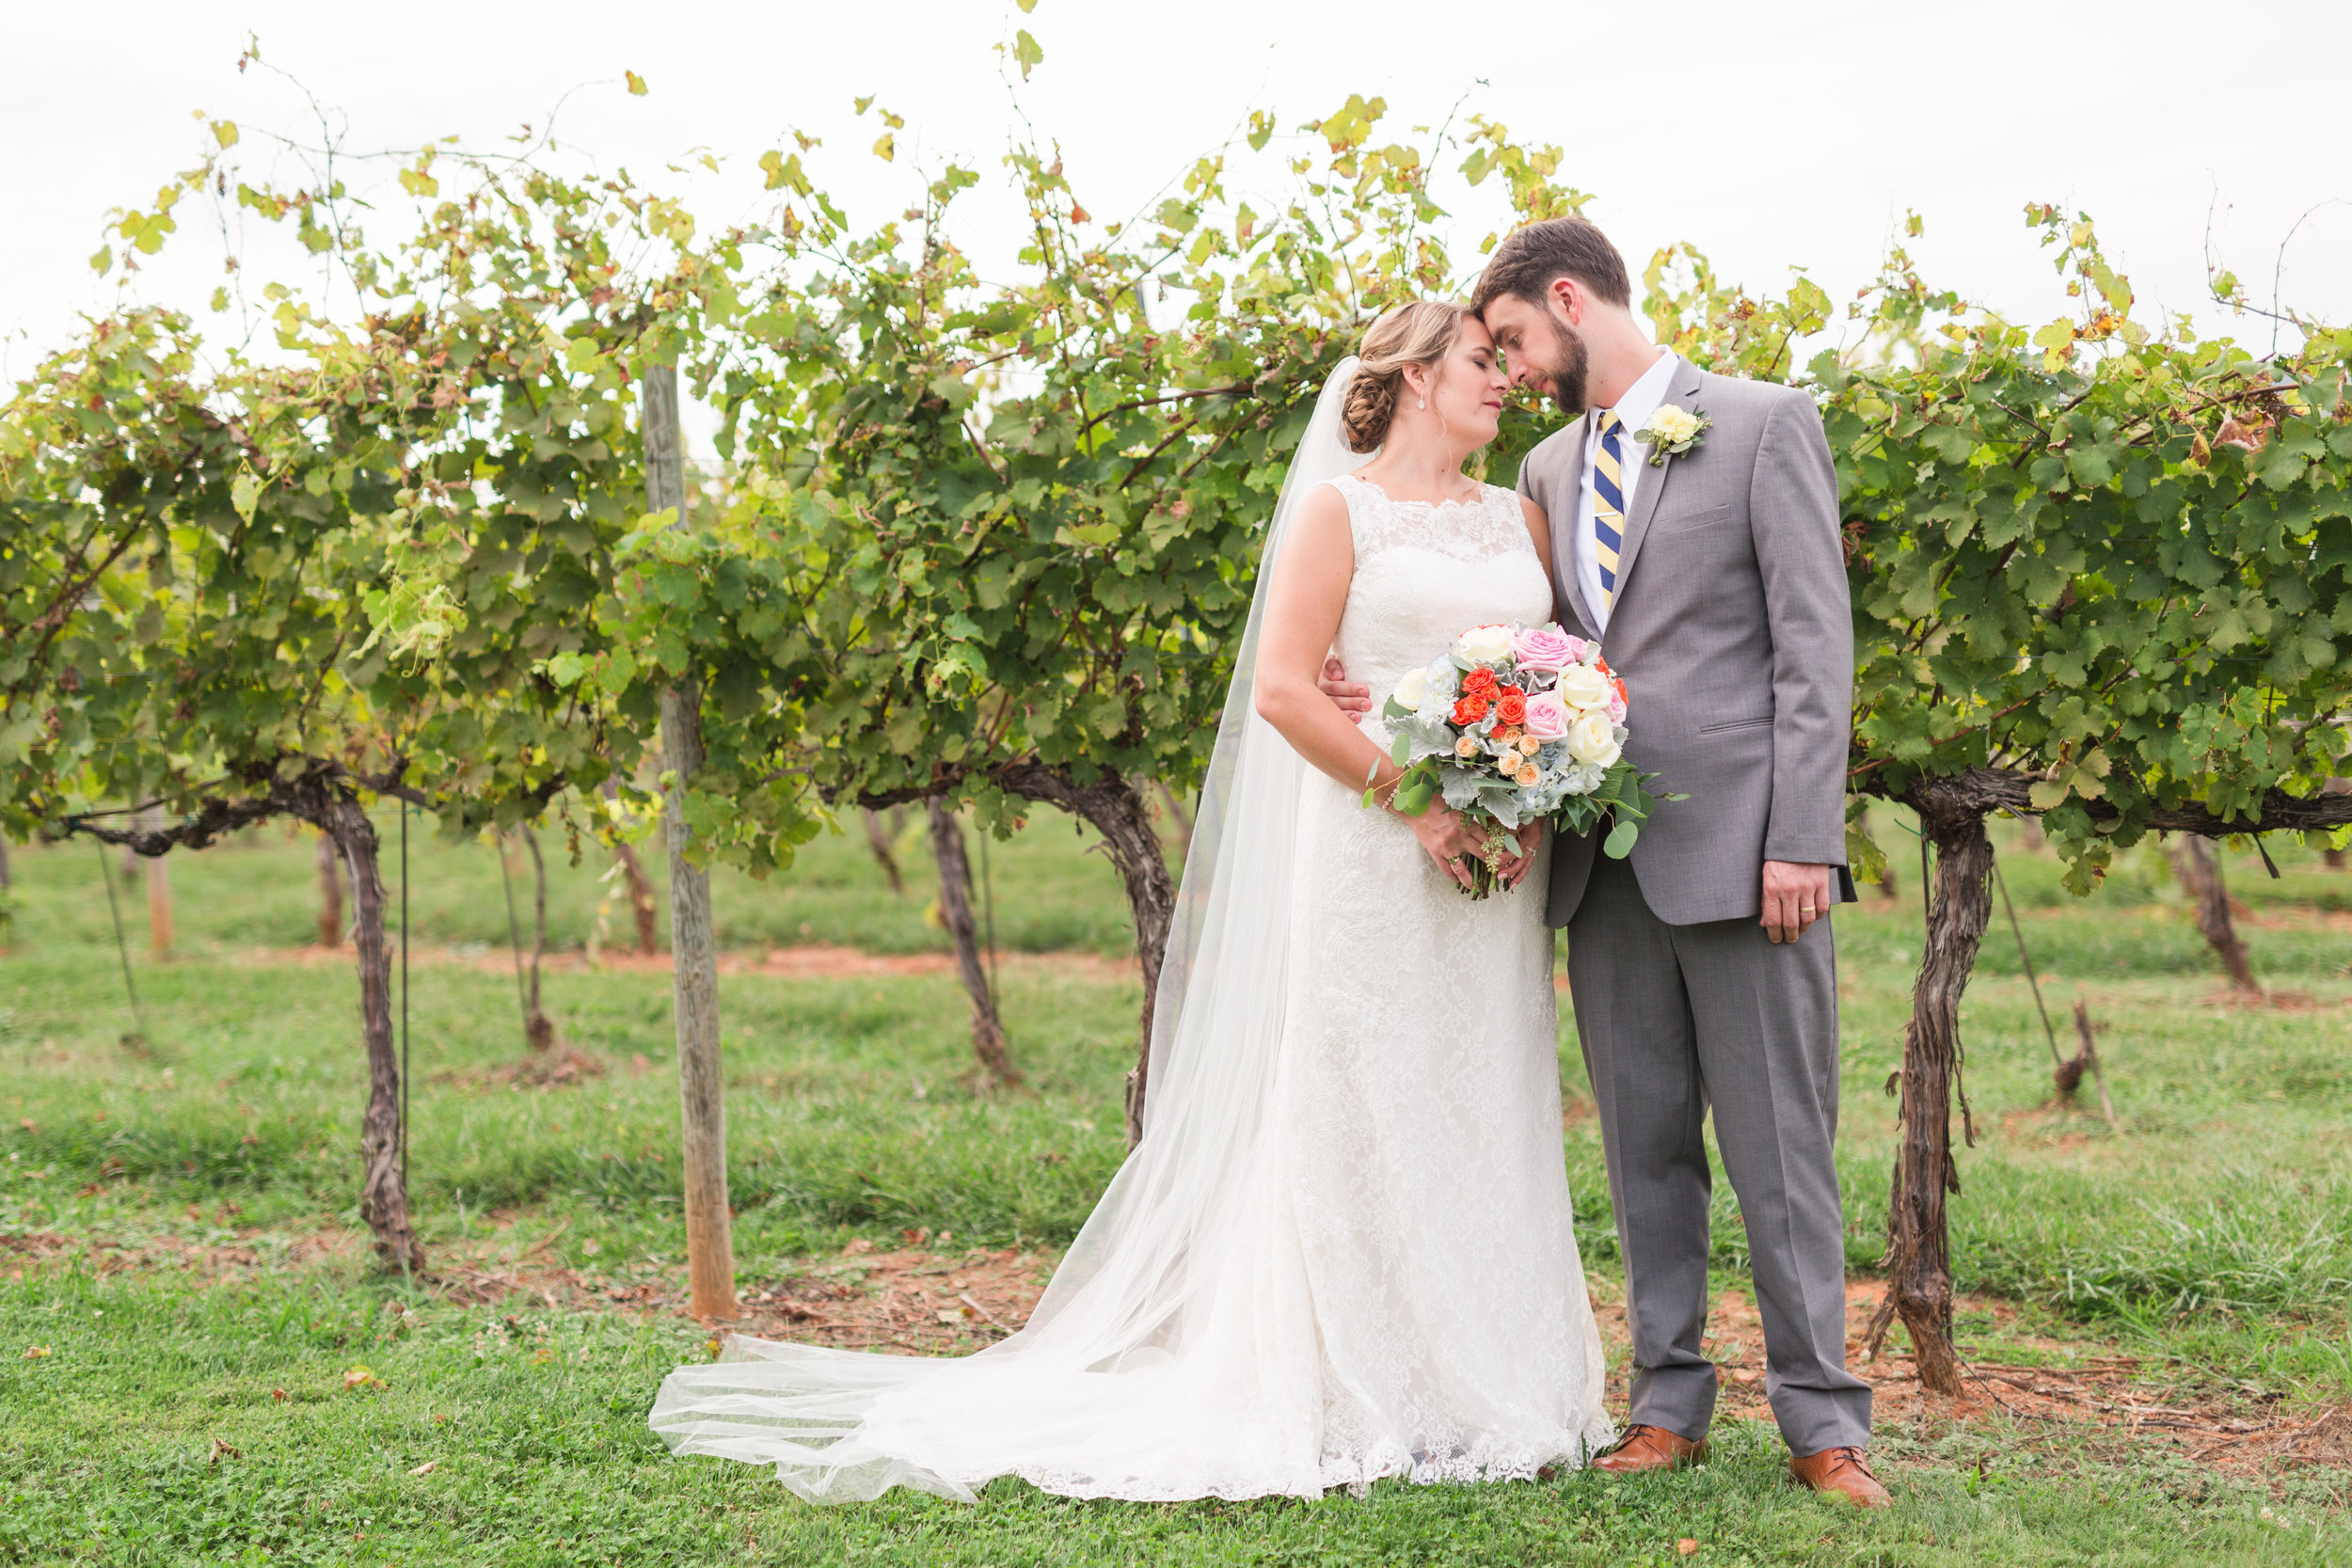 Write here…Lynchburg Virginia Wedding Photographer || Central Virginia Wedding Photos || Ashley Eiban Photography || www.ashleyeiban.com || Keswick Vineyard Wedding